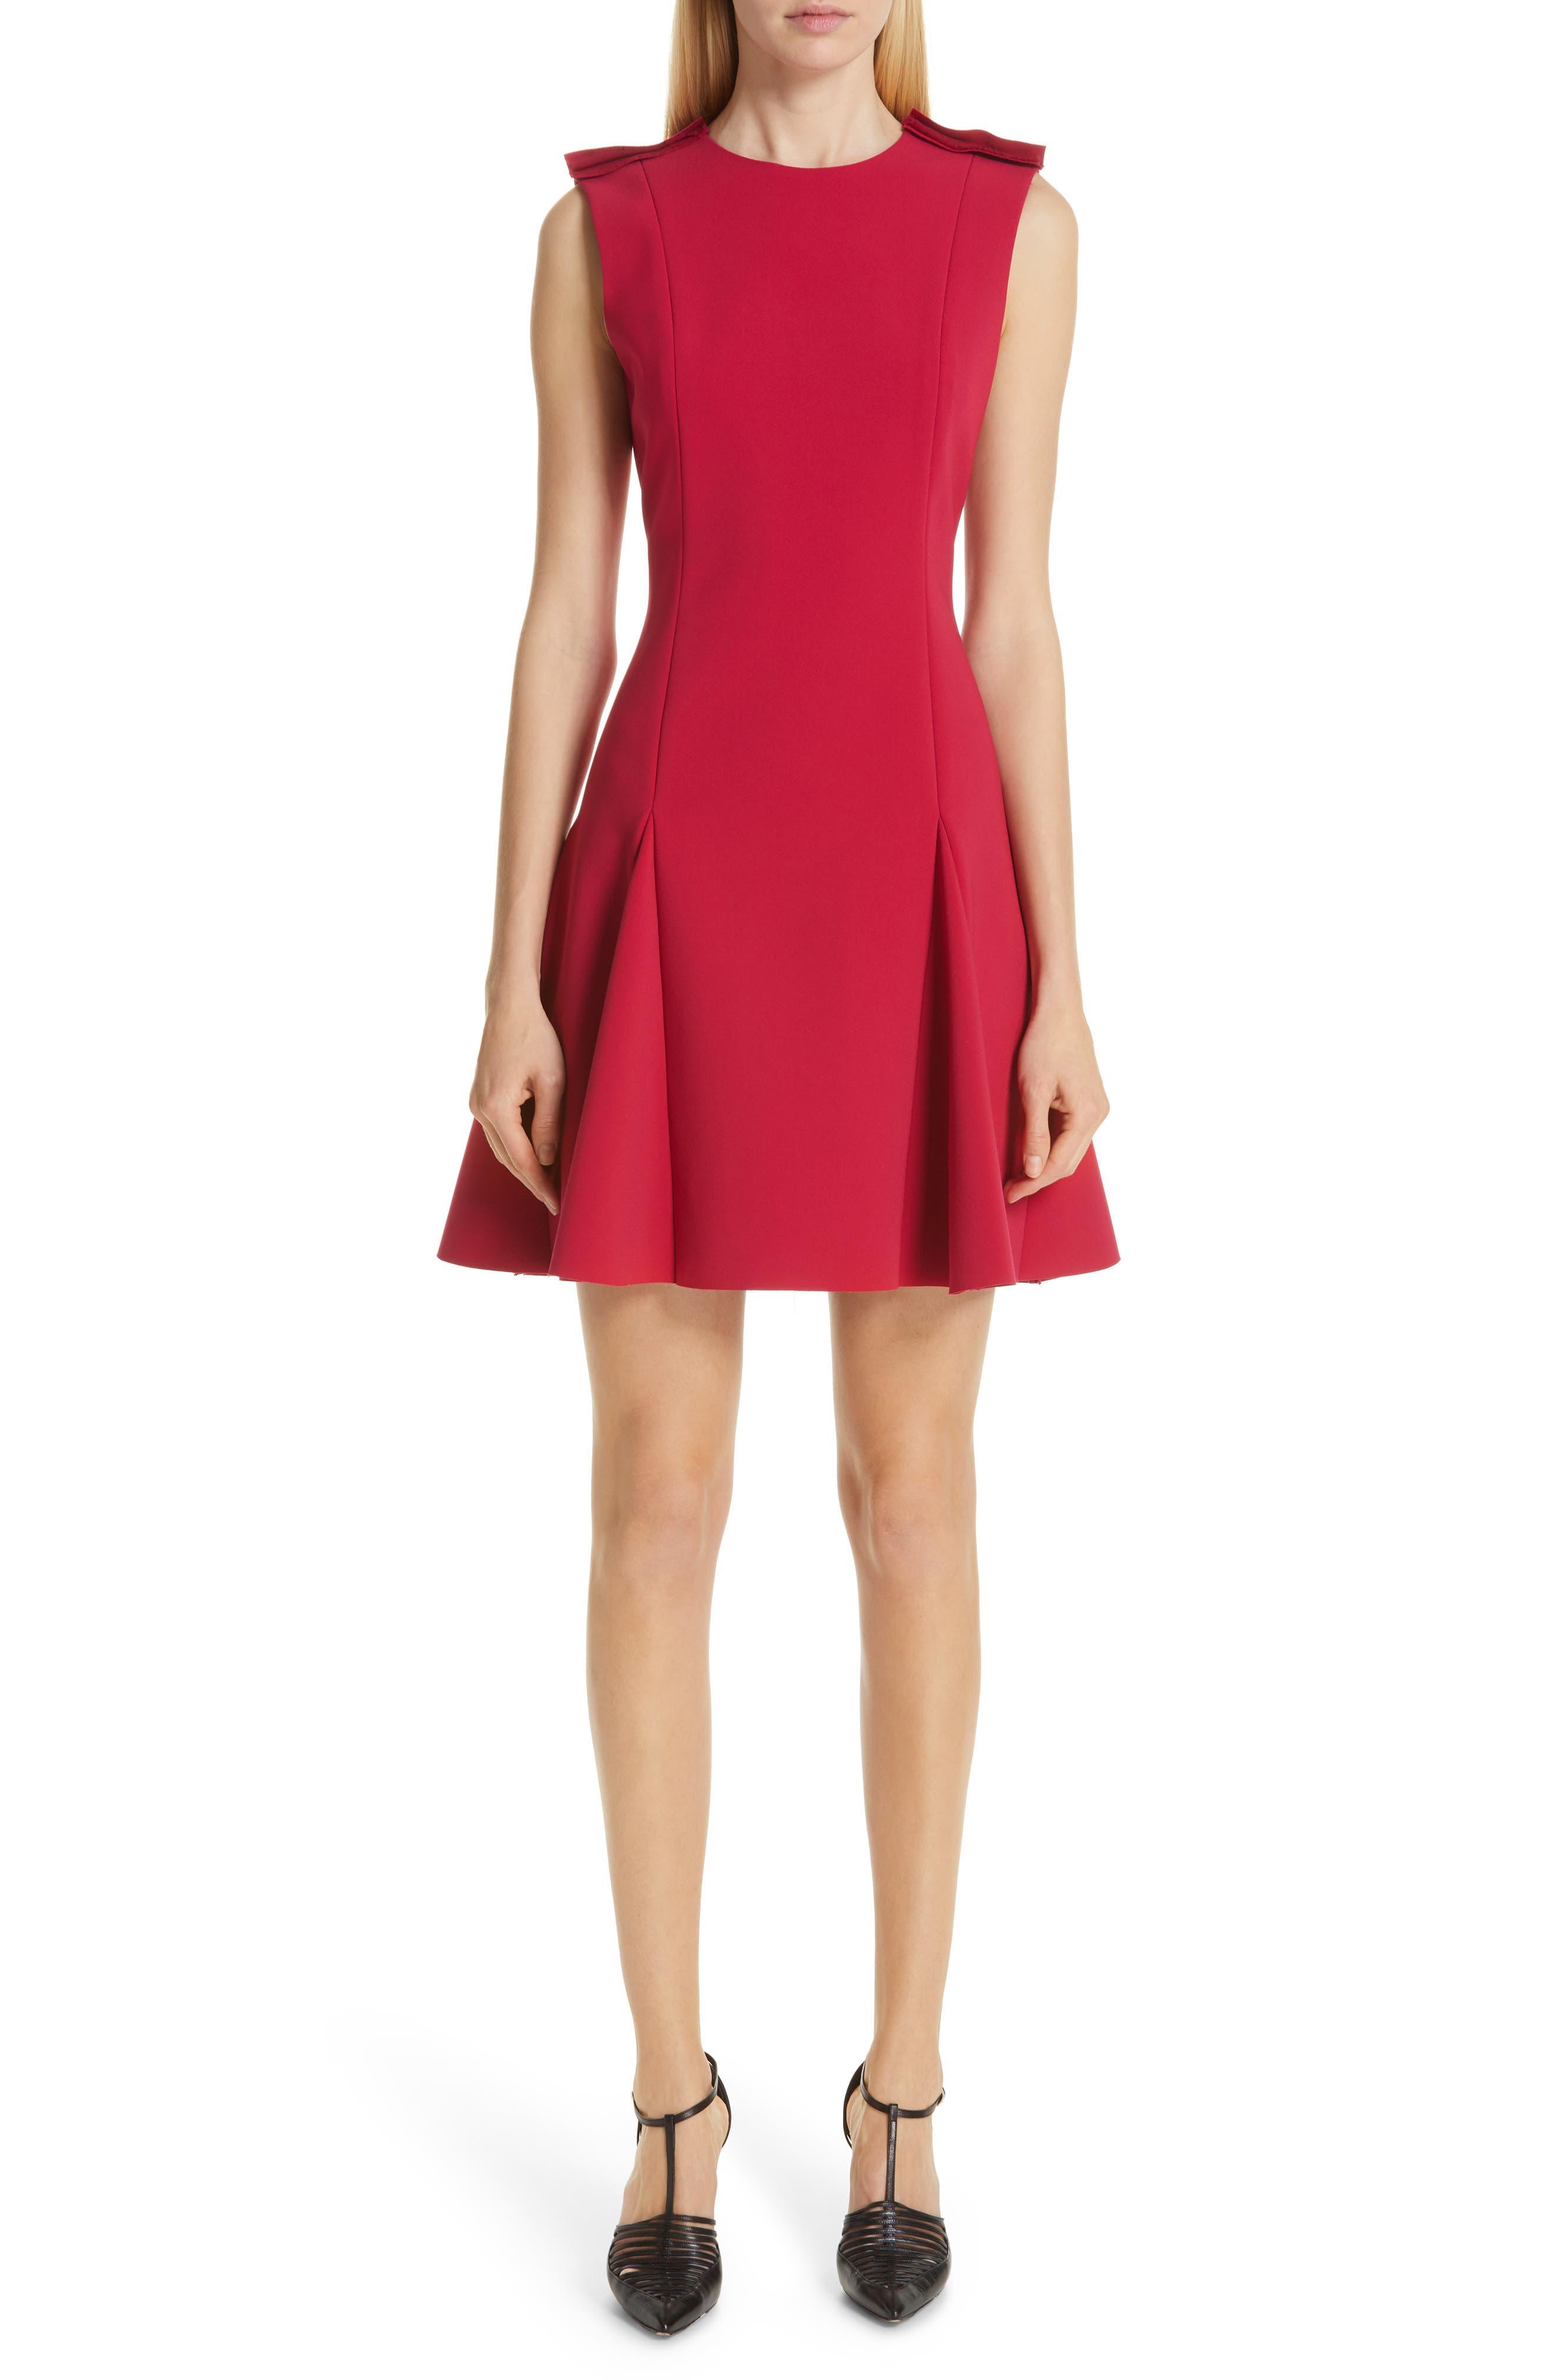 Jason Wu Collection Stretch Crepe Godet Dress, Pink